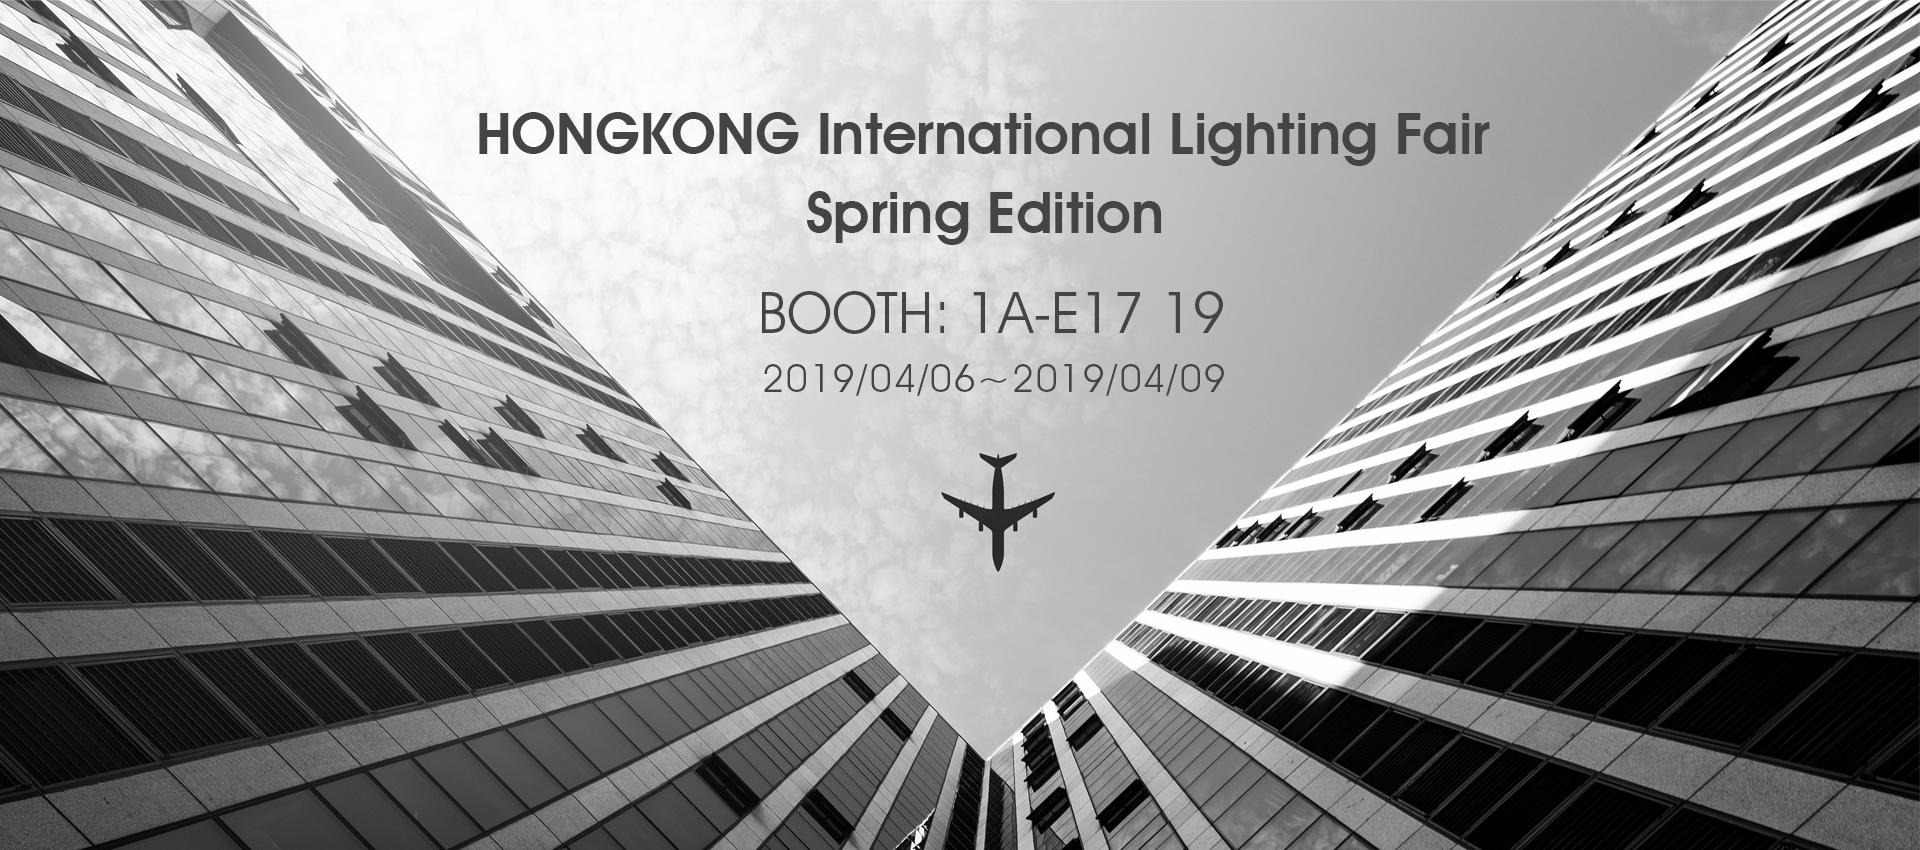 2019香港春季展览 网站banner